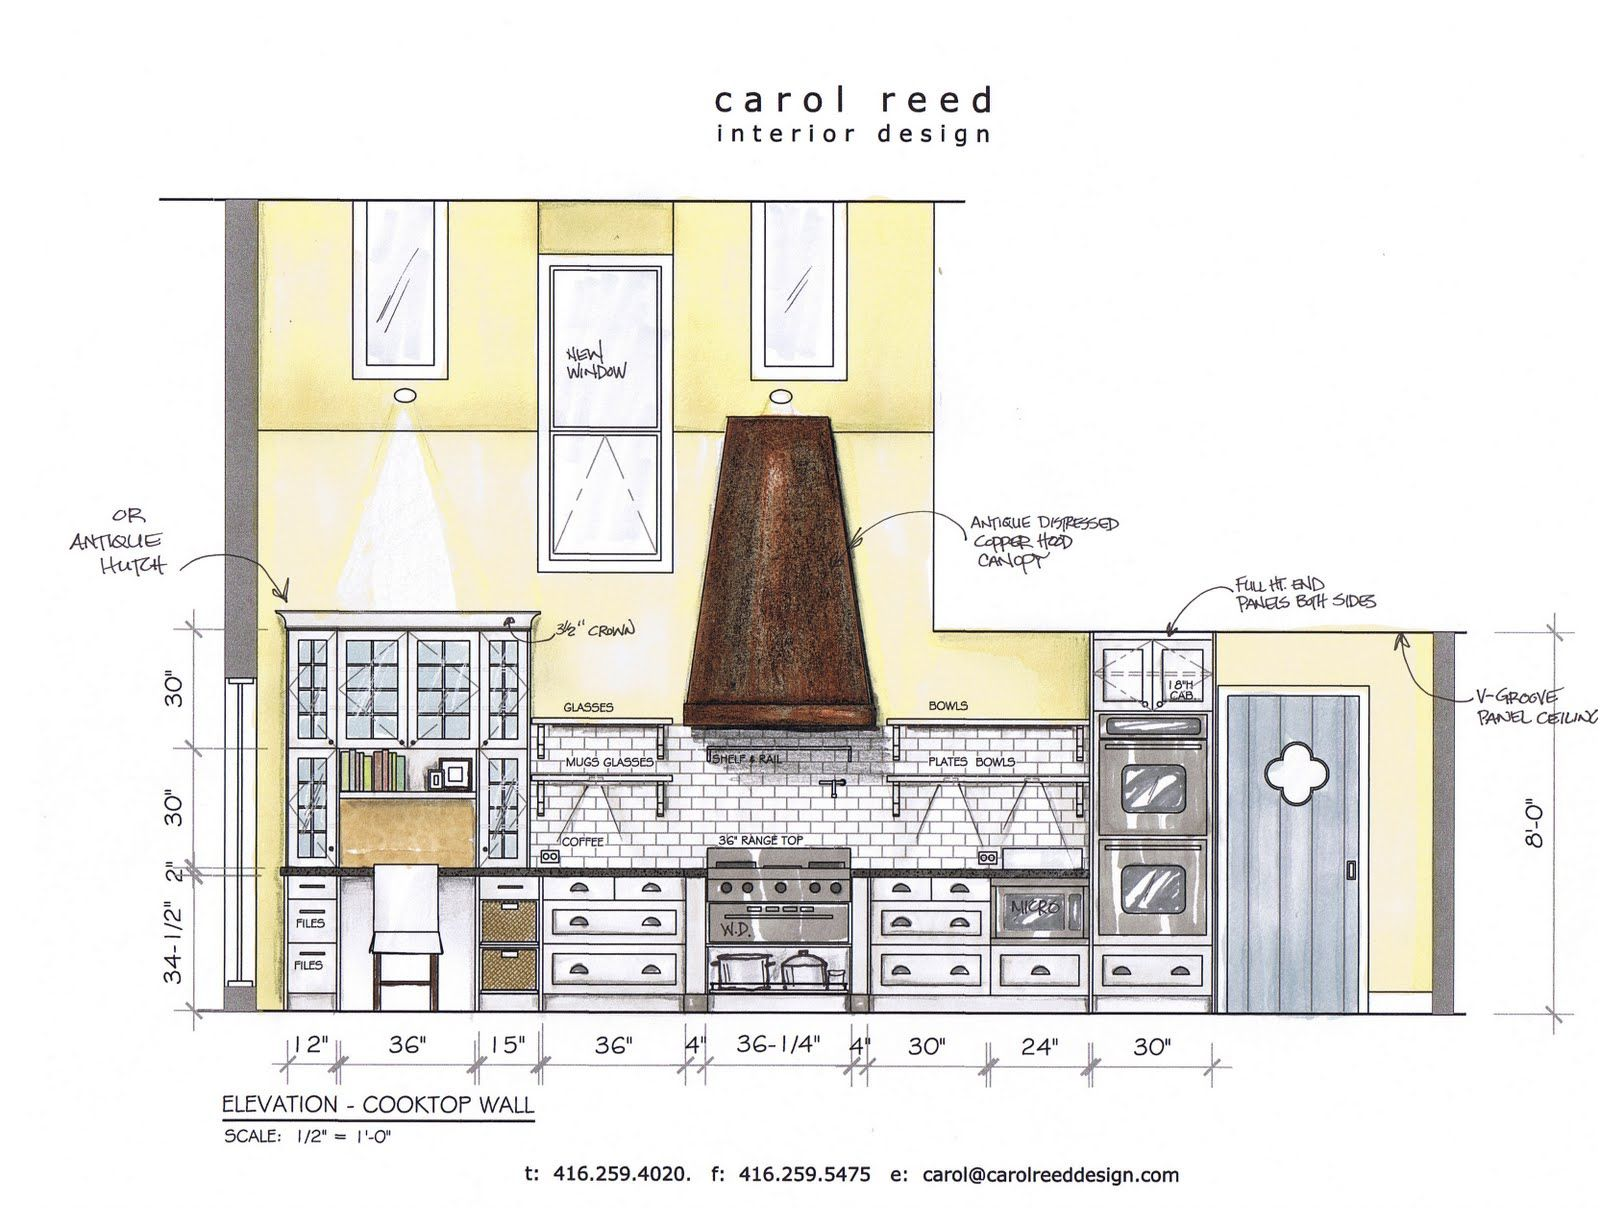 8 Trend Kitchen Design Details Pictures in 2020